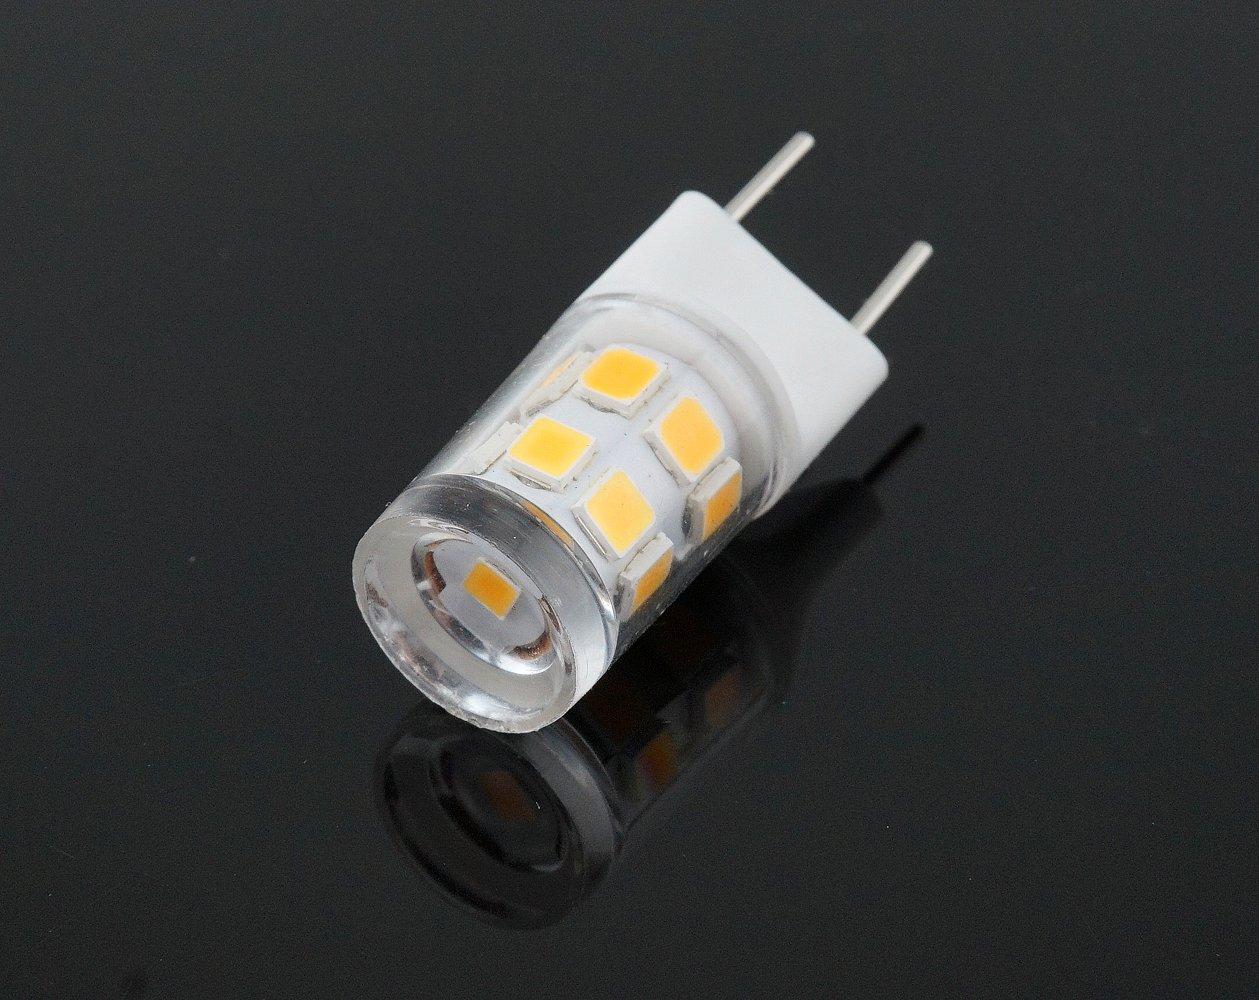 Bonlux LED G8 Light Bulb 2 Watts Warm White T4 G8 Base Bi Pin Xenon JCD  Type LED 120V 20W Halogen Replacement Bulb For Under Counter Kitchen  Lighting, ...